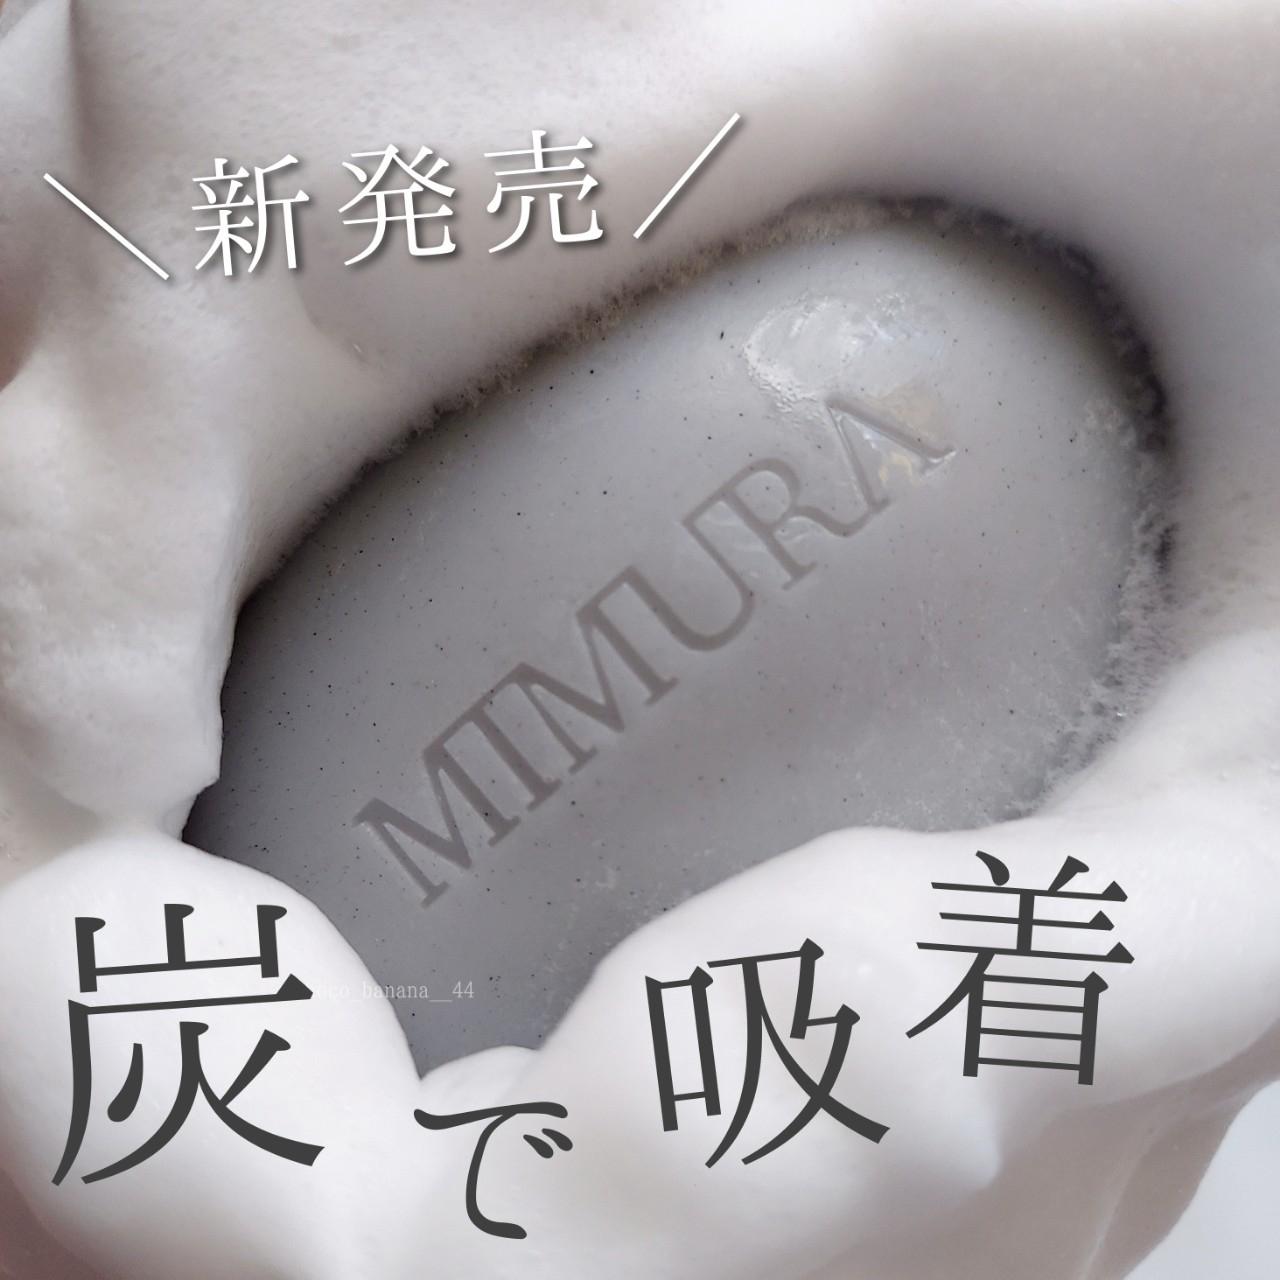 MIMURA(ミムラ) スキンケアソープの良い点・メリットに関するししさんの口コミ画像1